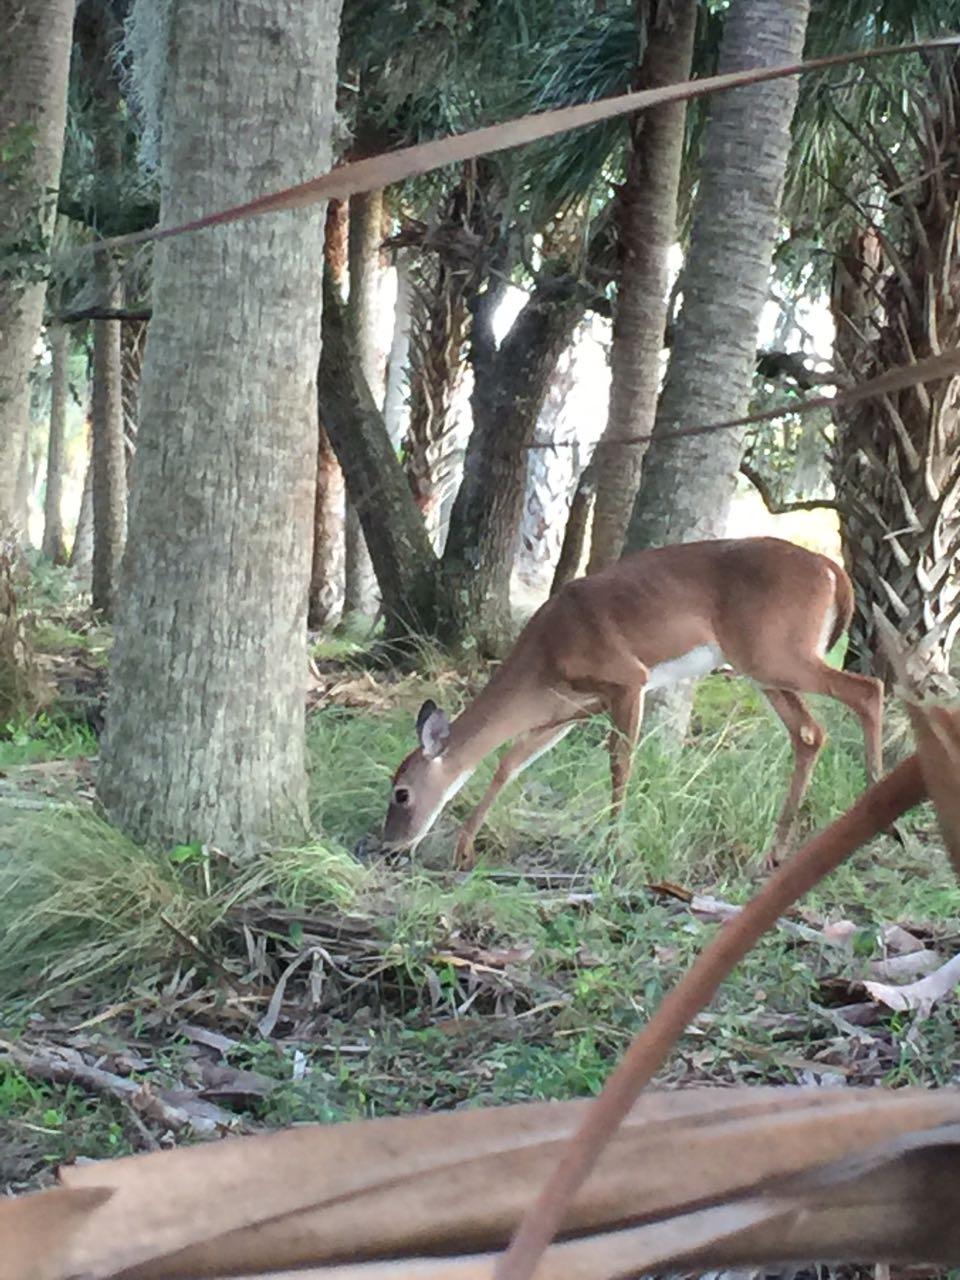 deseret-cattle-citrus-florida-ranch-doe-deer.jpg